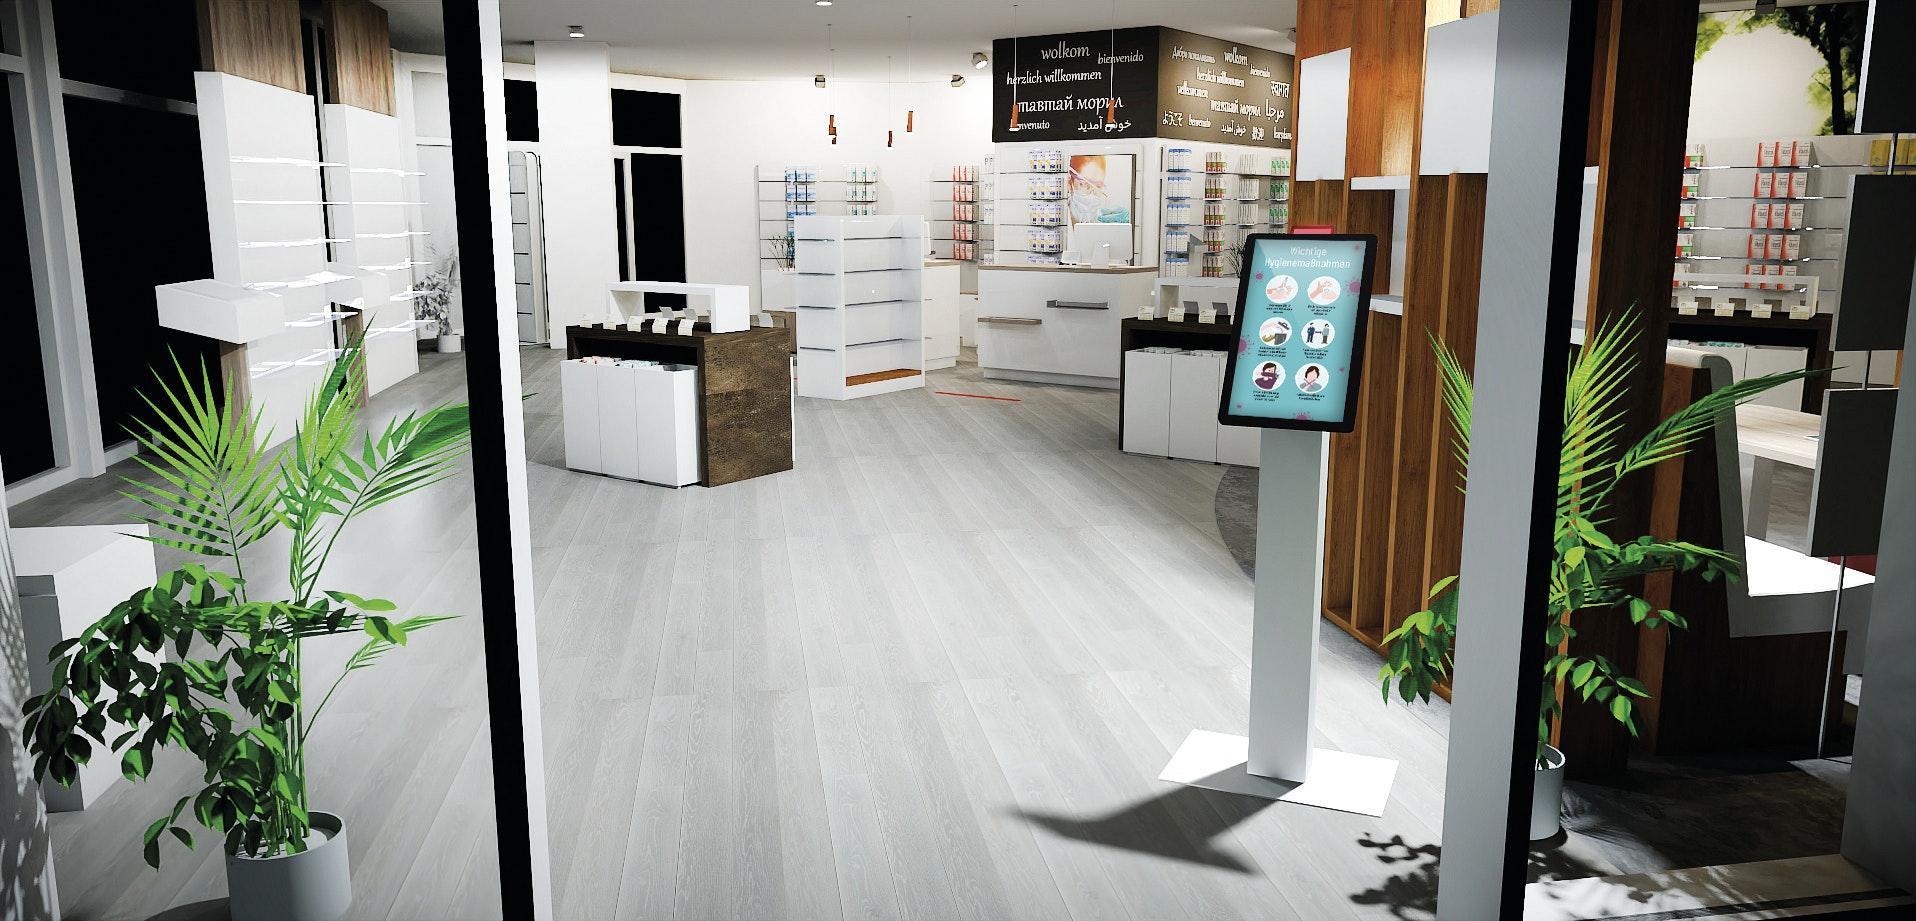 APOSTORE Zutrittskontrolle Digital Butler Eingangsbereich Apotheke